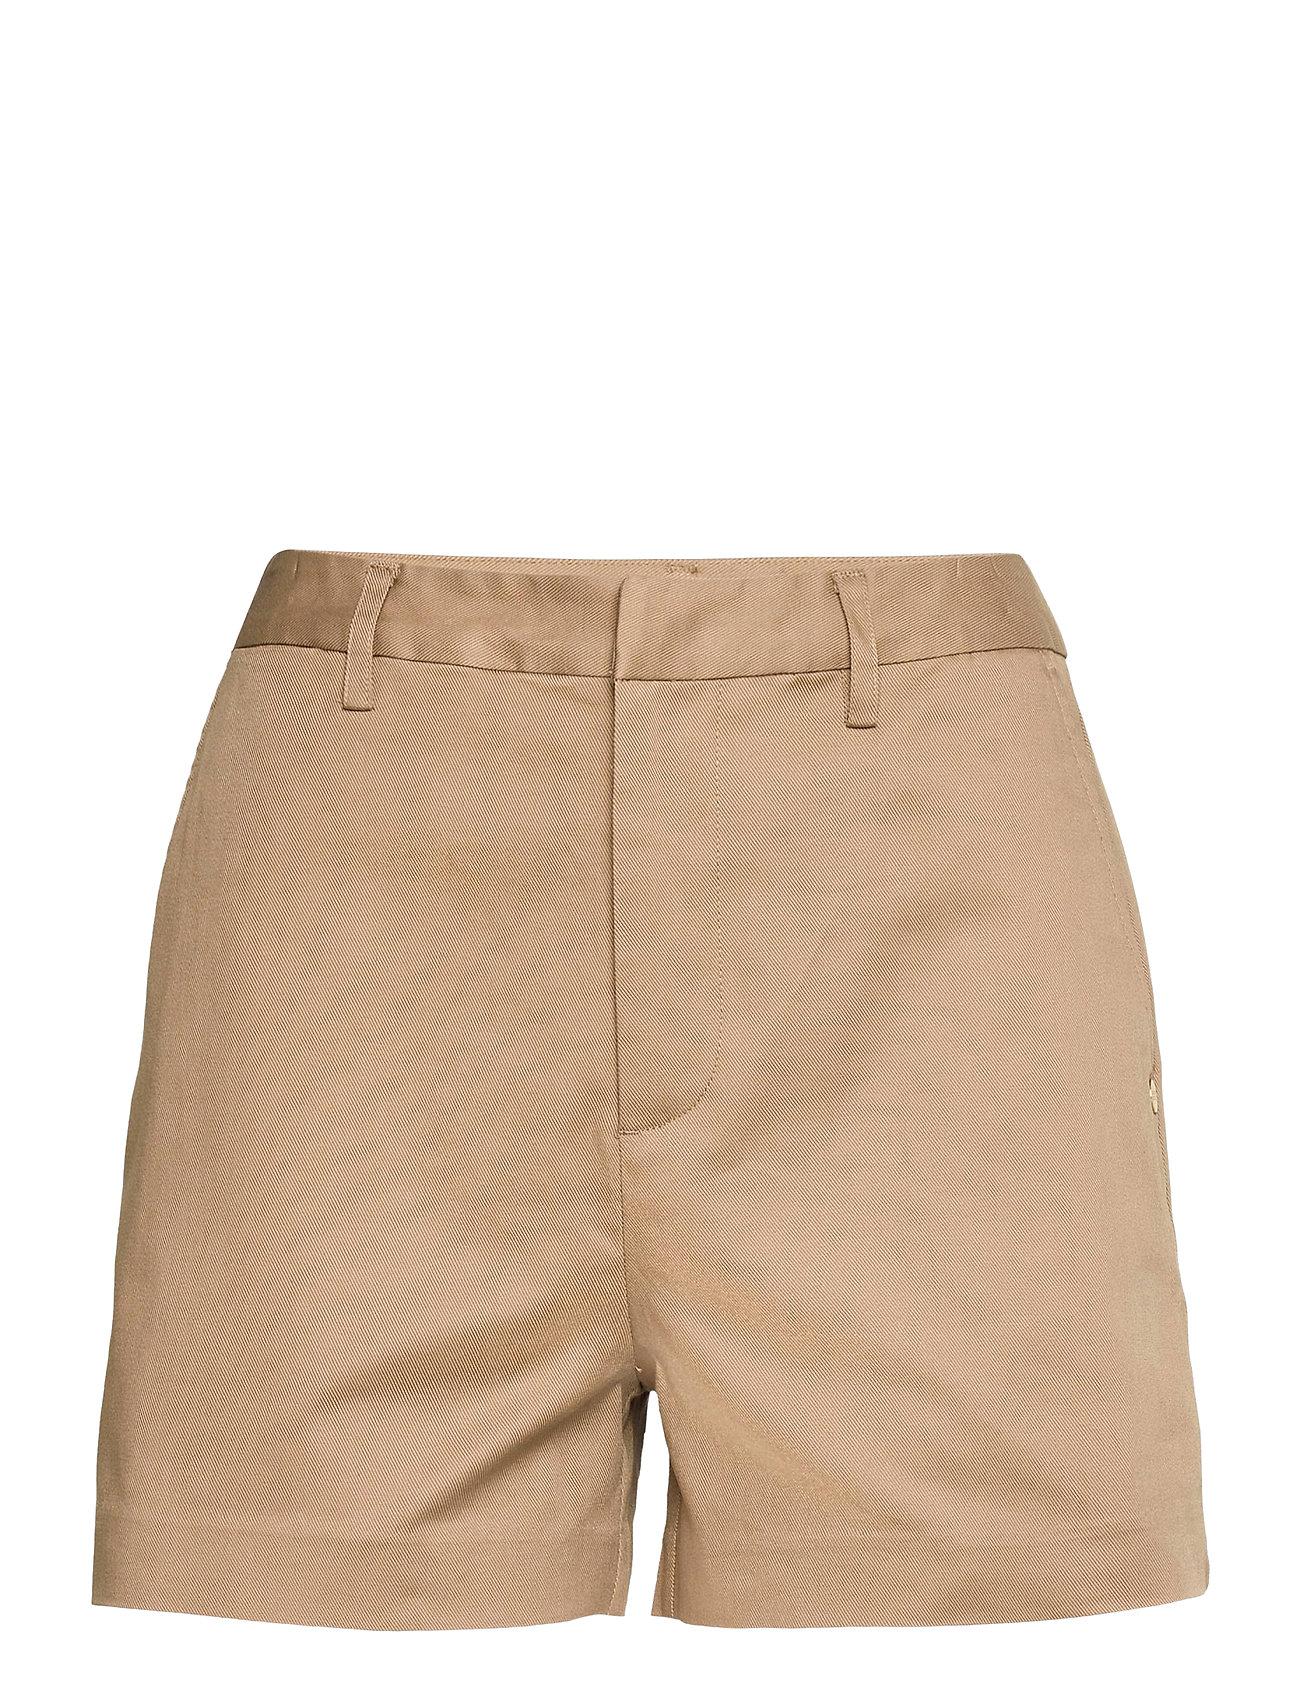 Image of 'Abott' Organic Cotton Chino Shorts Shorts Chino Shorts Beige Scotch & Soda (3500881765)